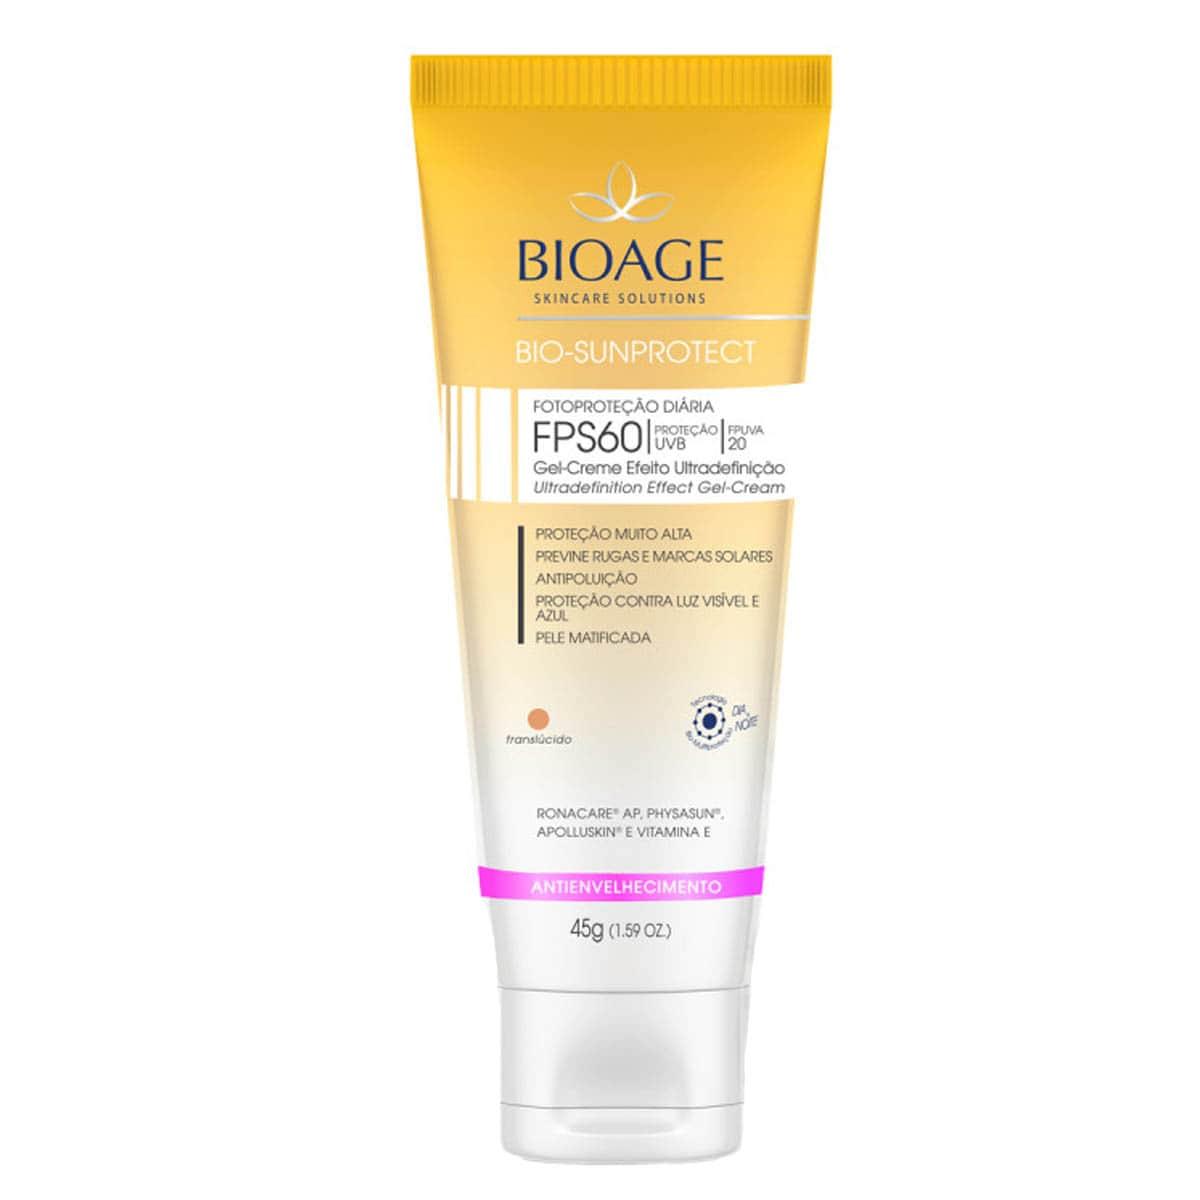 Bio Sunprotect Translucido FPS 60 - 45G - Bioage